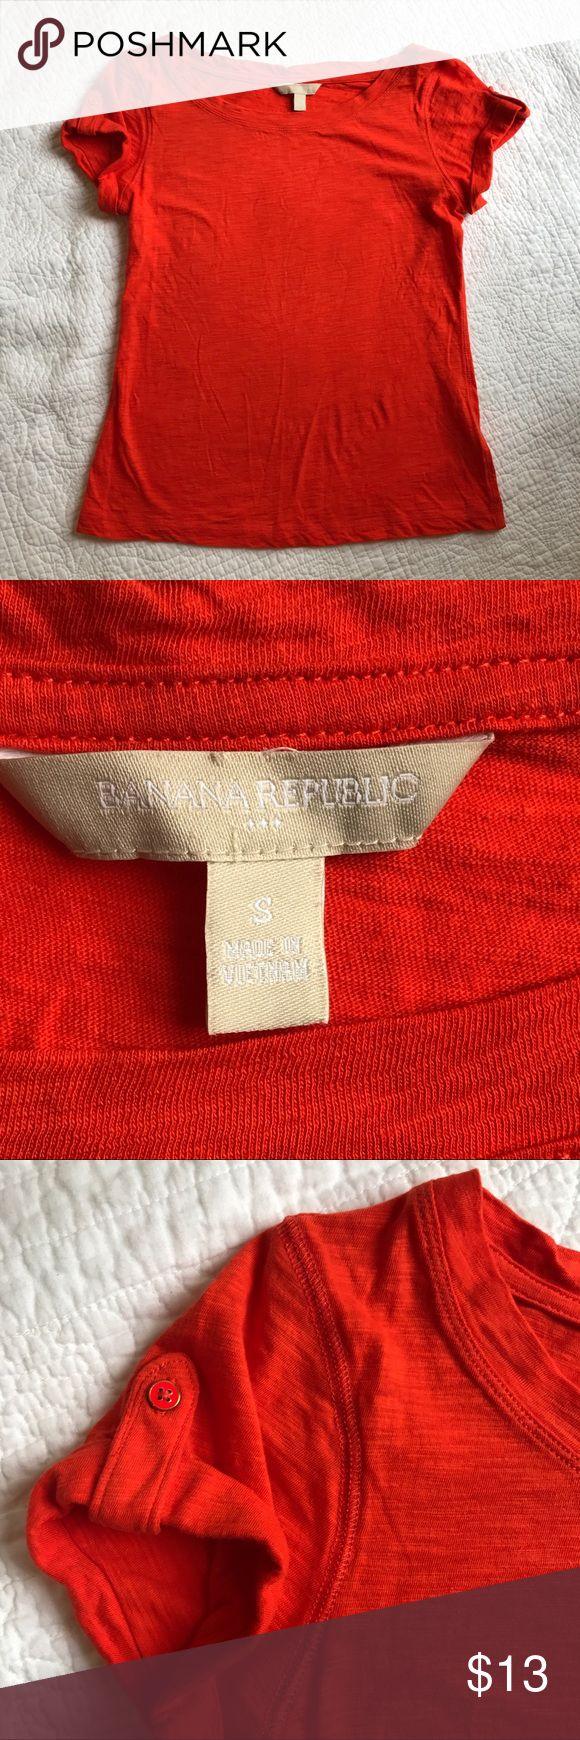 Banana Republic Tshirt - size S Short sleeves   buttoned detail   coral   small   EUC Banana Republic Tops Tees - Short Sleeve